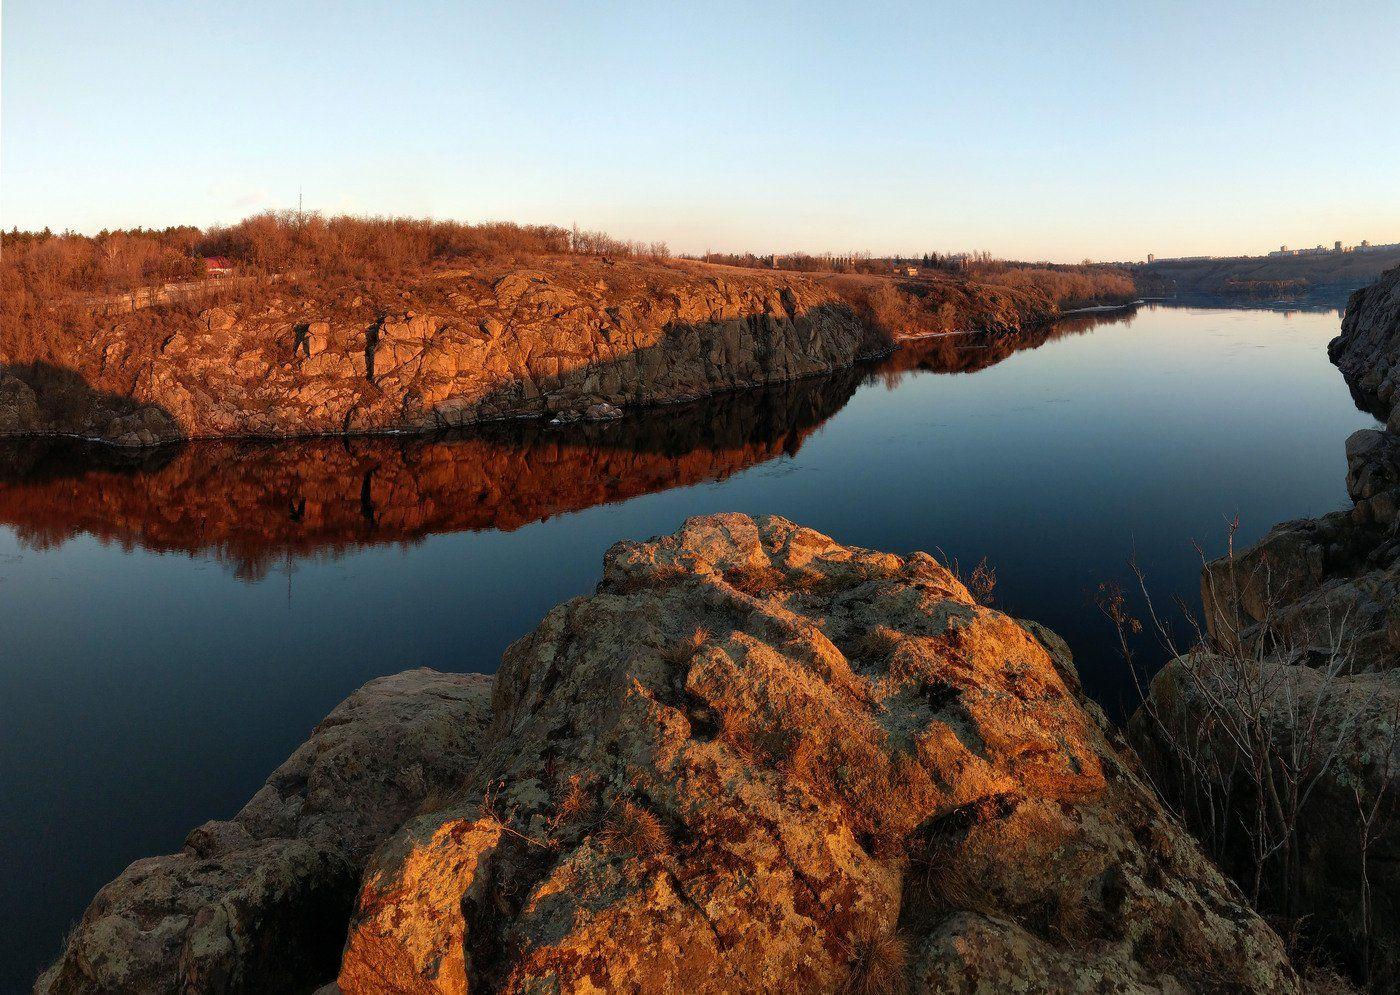 река,днепр,пейзаж,скалы,берег,landscape,хортица, Сергей Богачёв